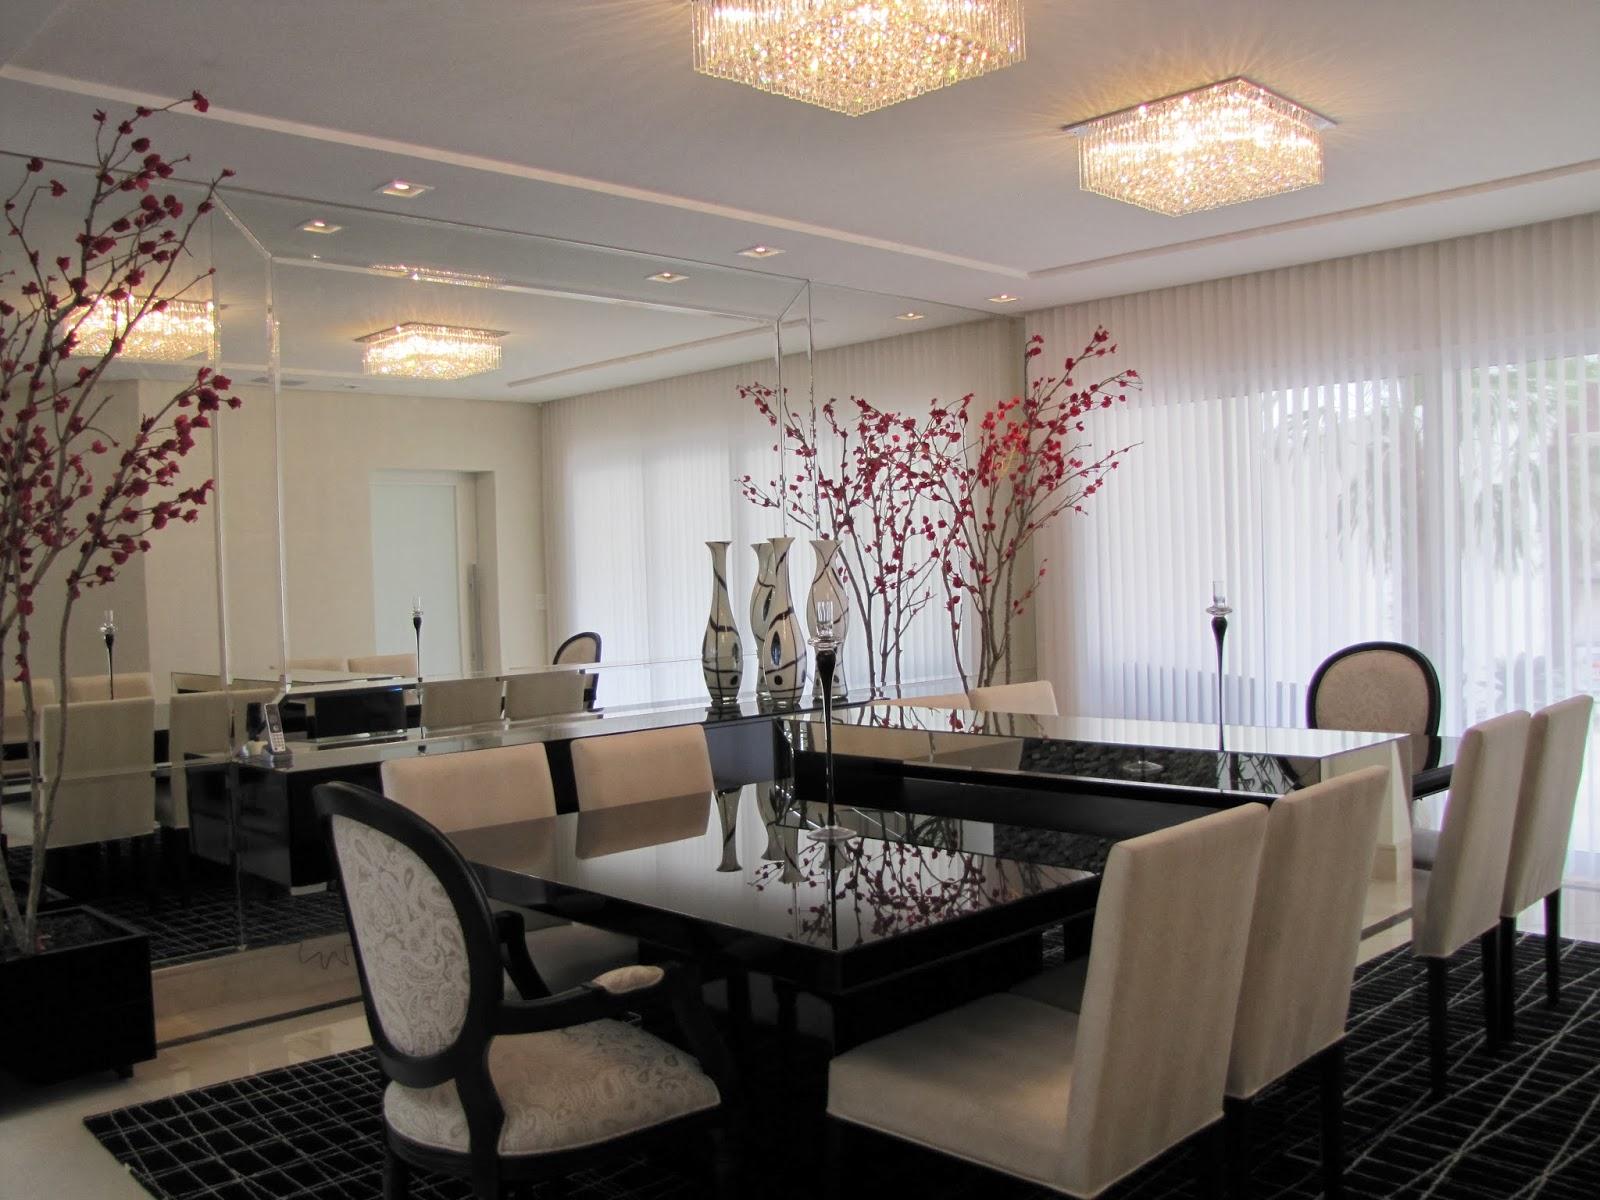 Sala De Jantar Koerich ~ Salas de jantar50 modelos maravilhosos e dicas de como decorar